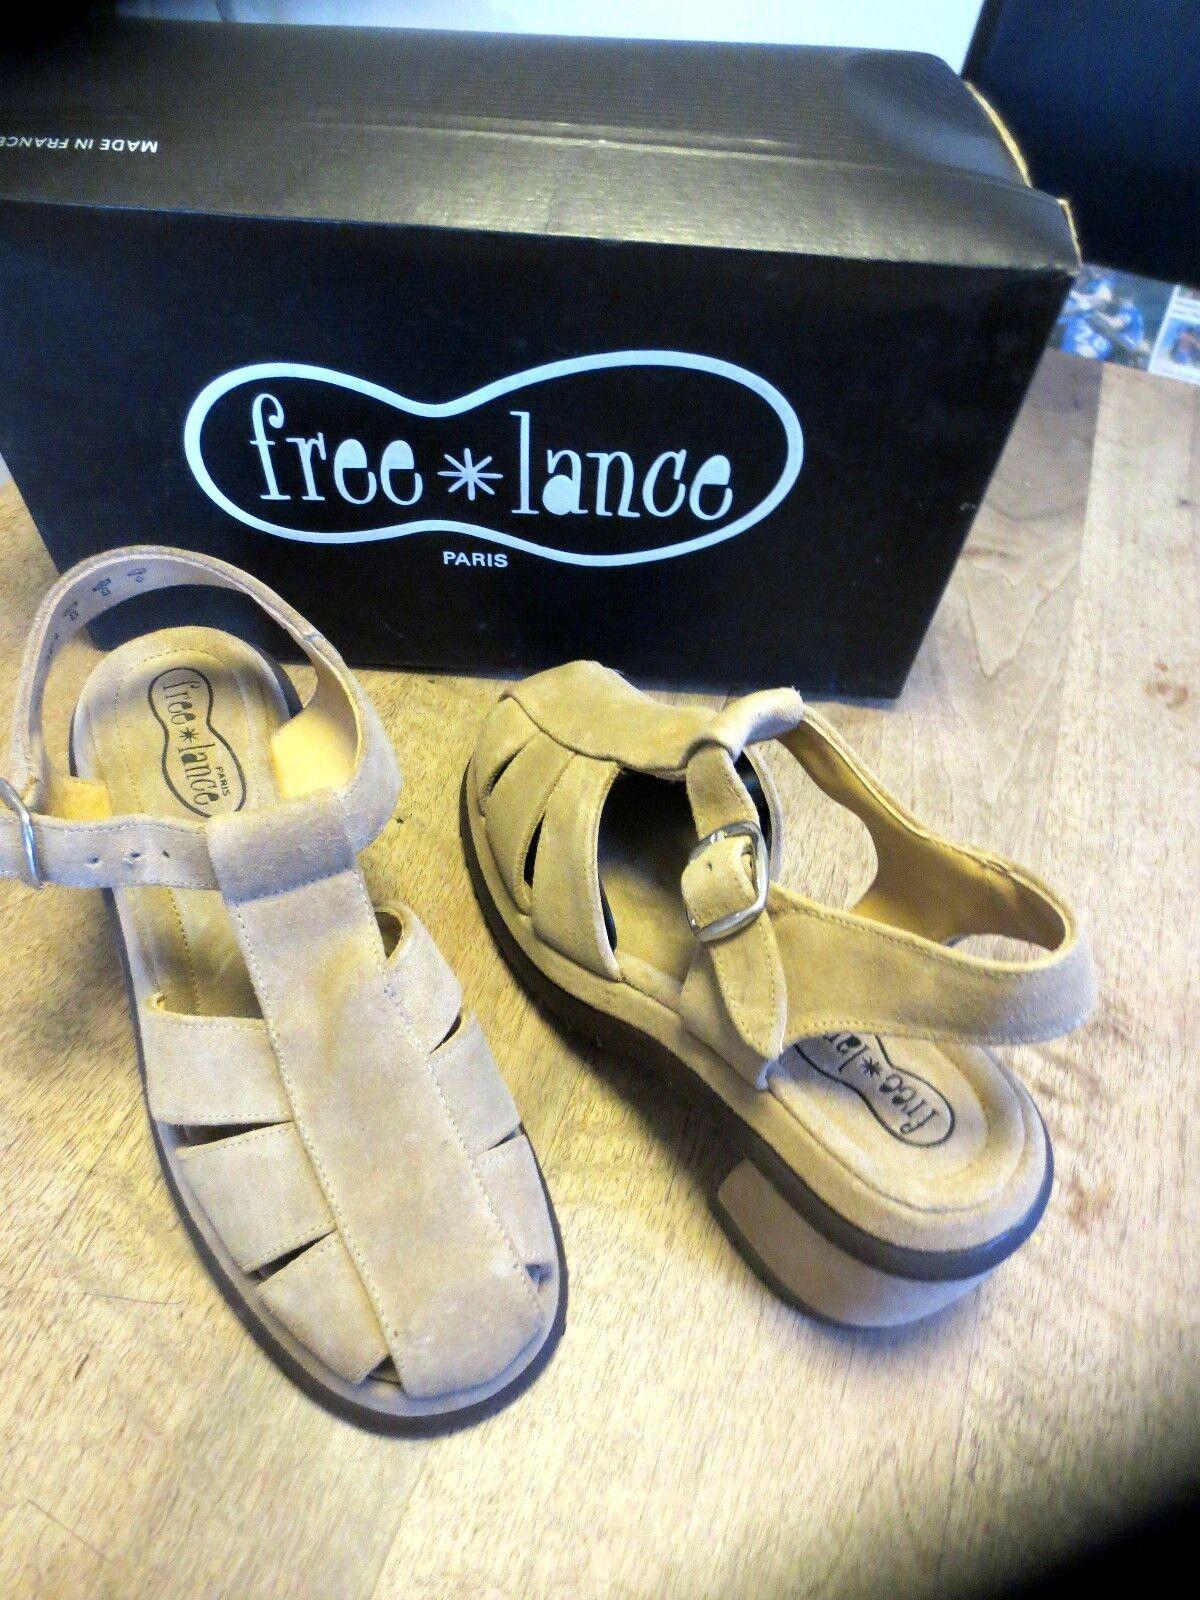 Free Lance Sandalia Vel natural natural natural nuevo talón 6 cm Tallas 35.5, 36.5  servicio considerado